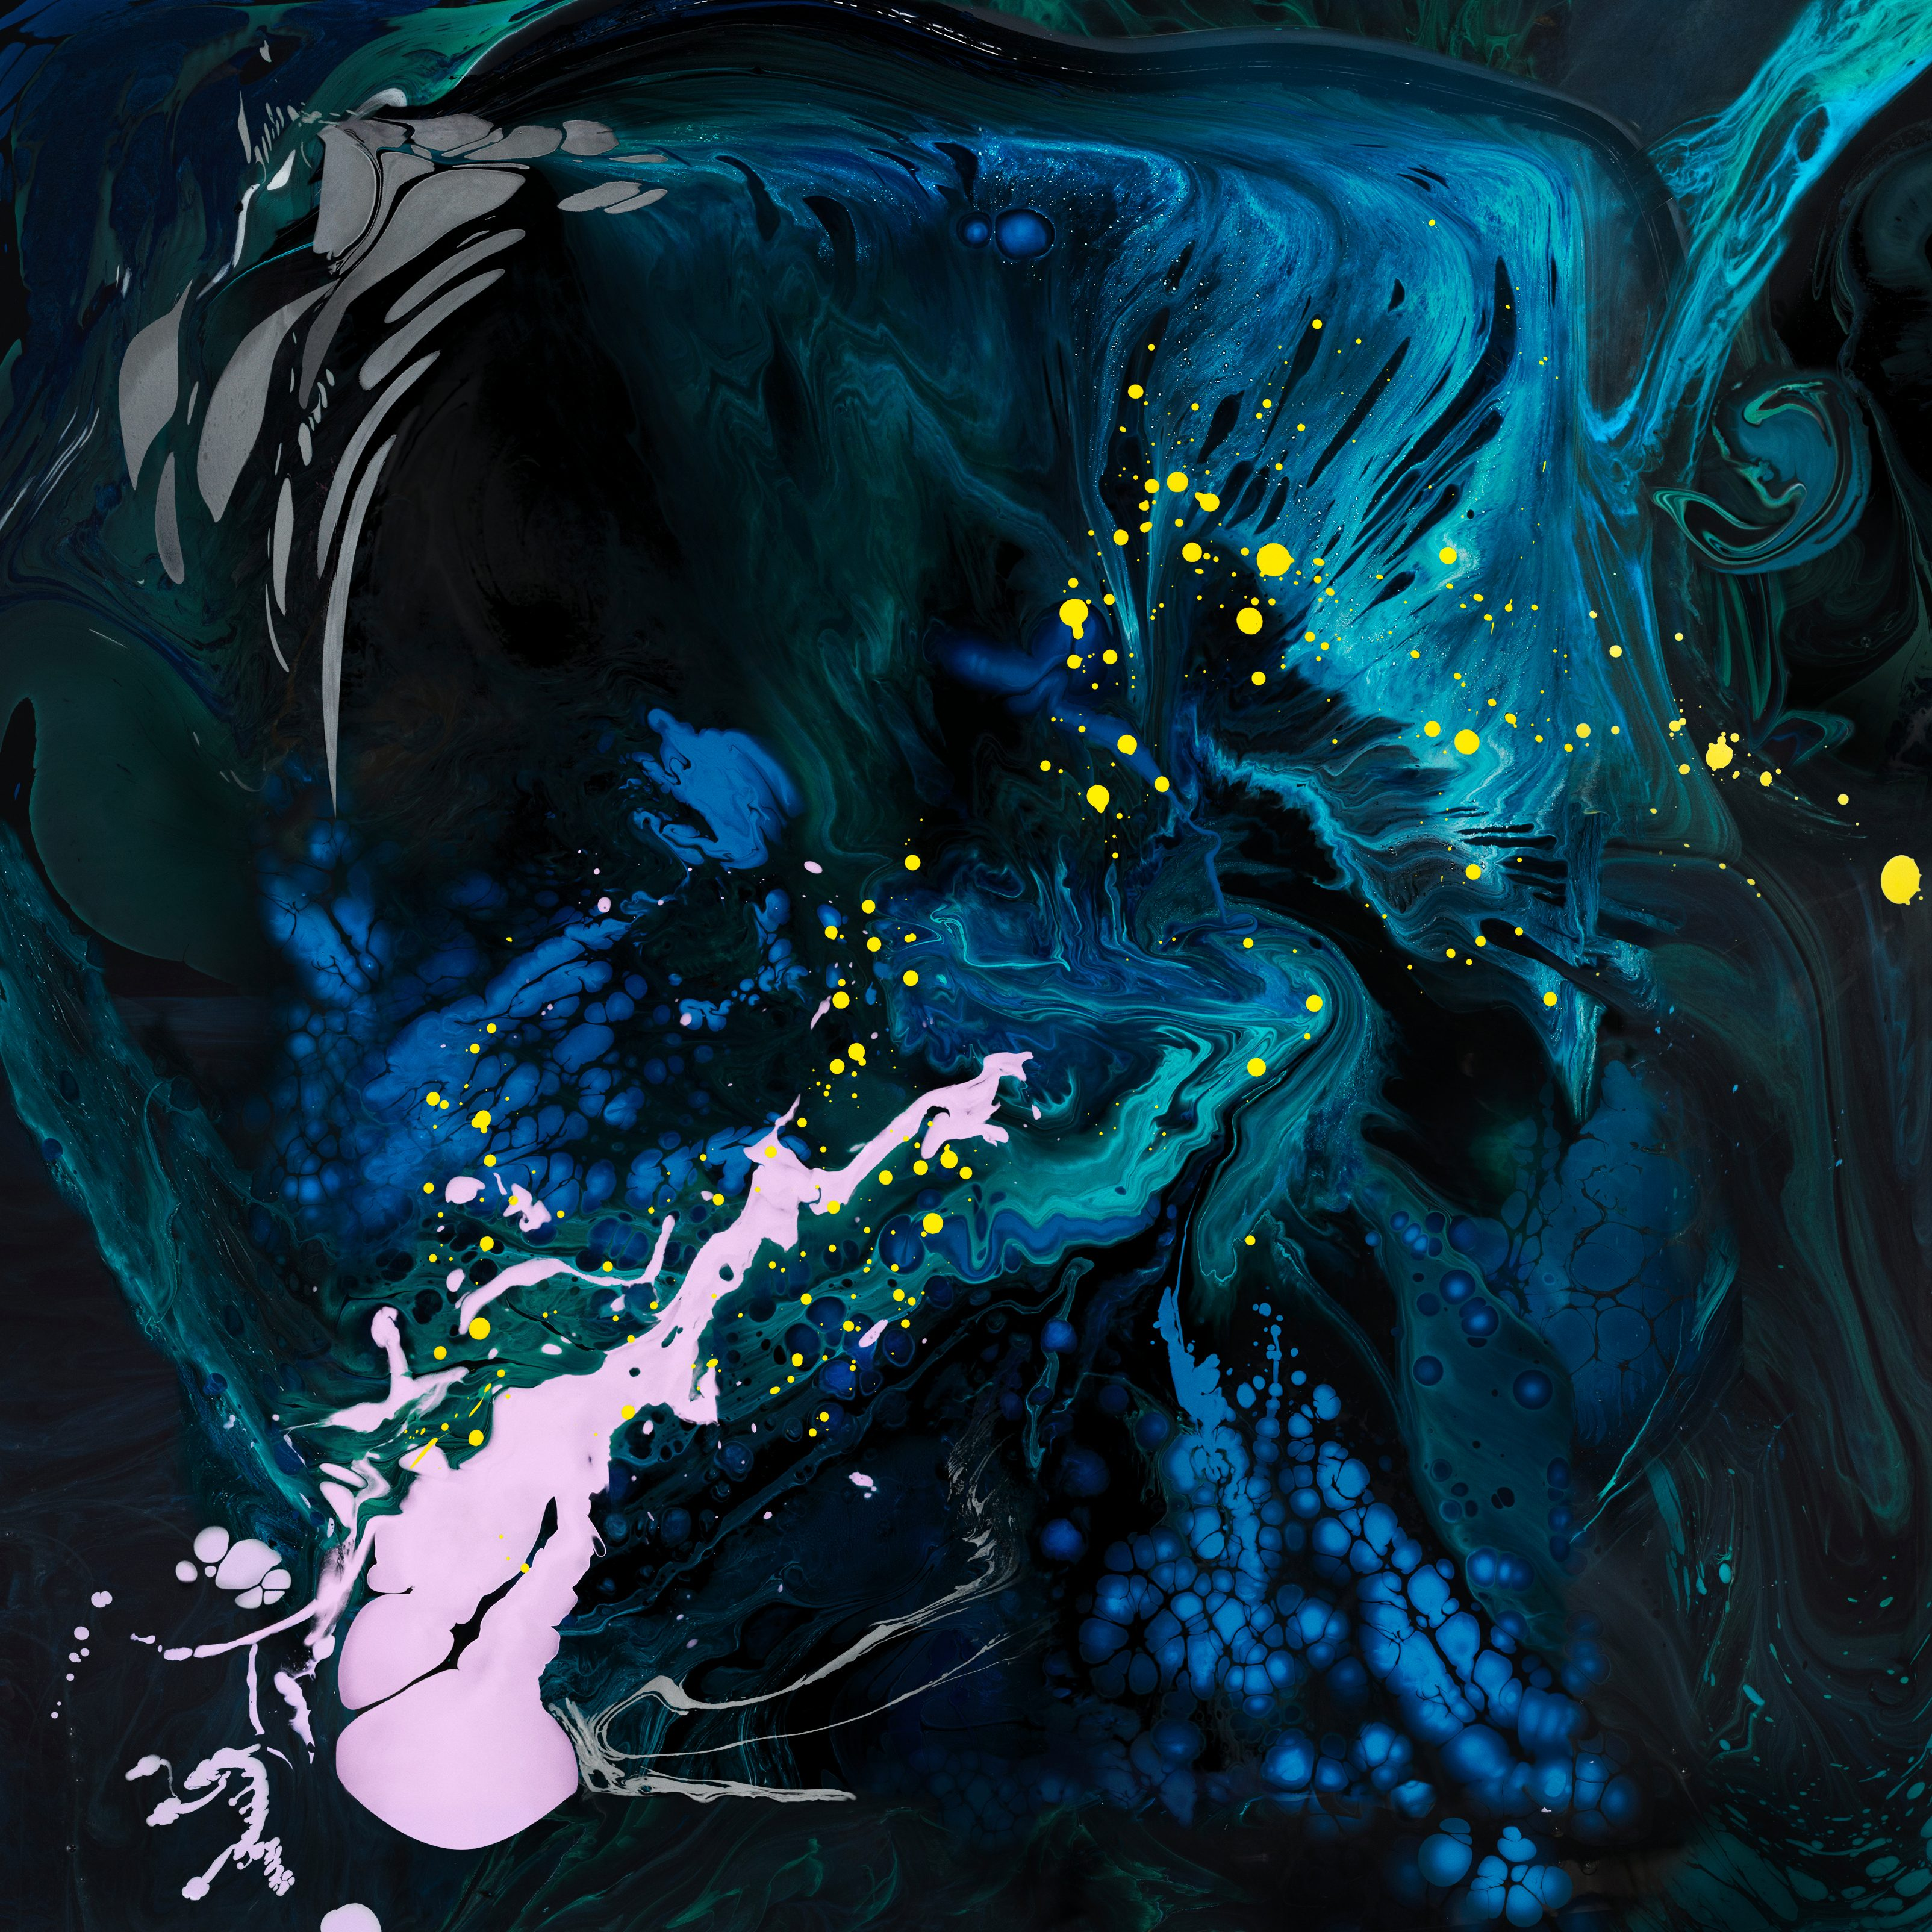 Ipad Pro 4k Wallpaper Liquid Art Blue Apple Stock Abstract 1388